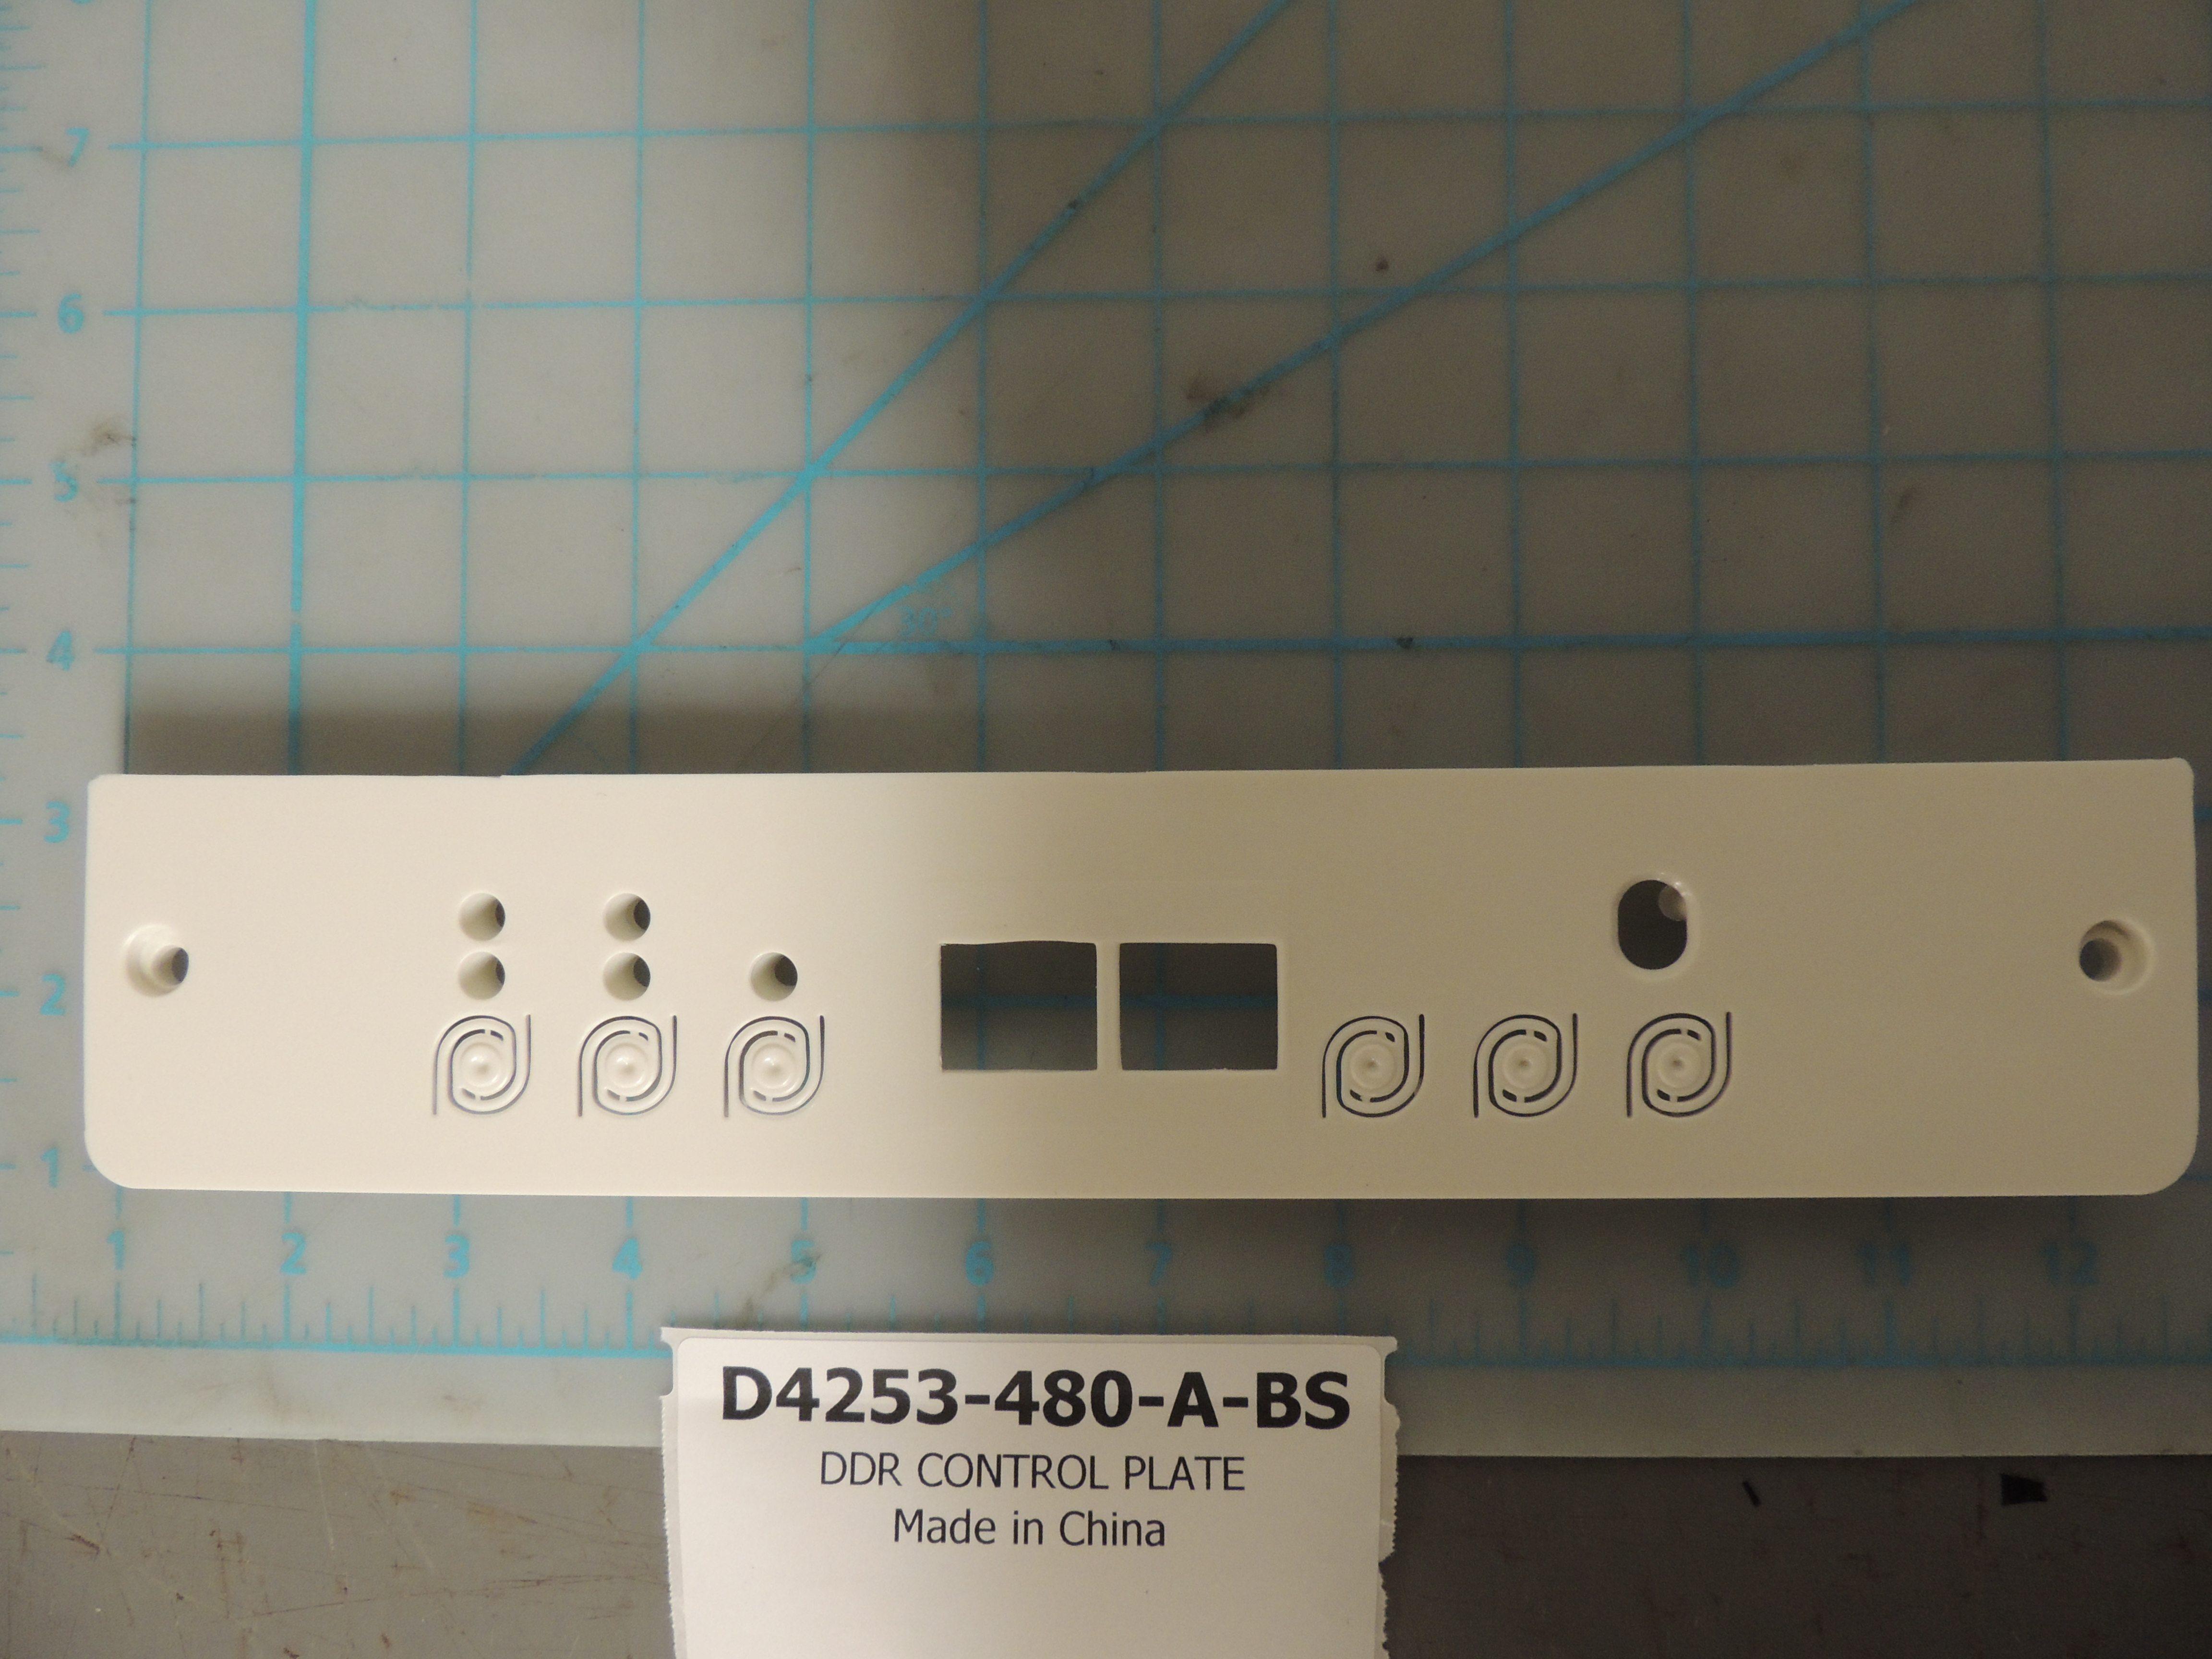 DDR CONTROL PLATE